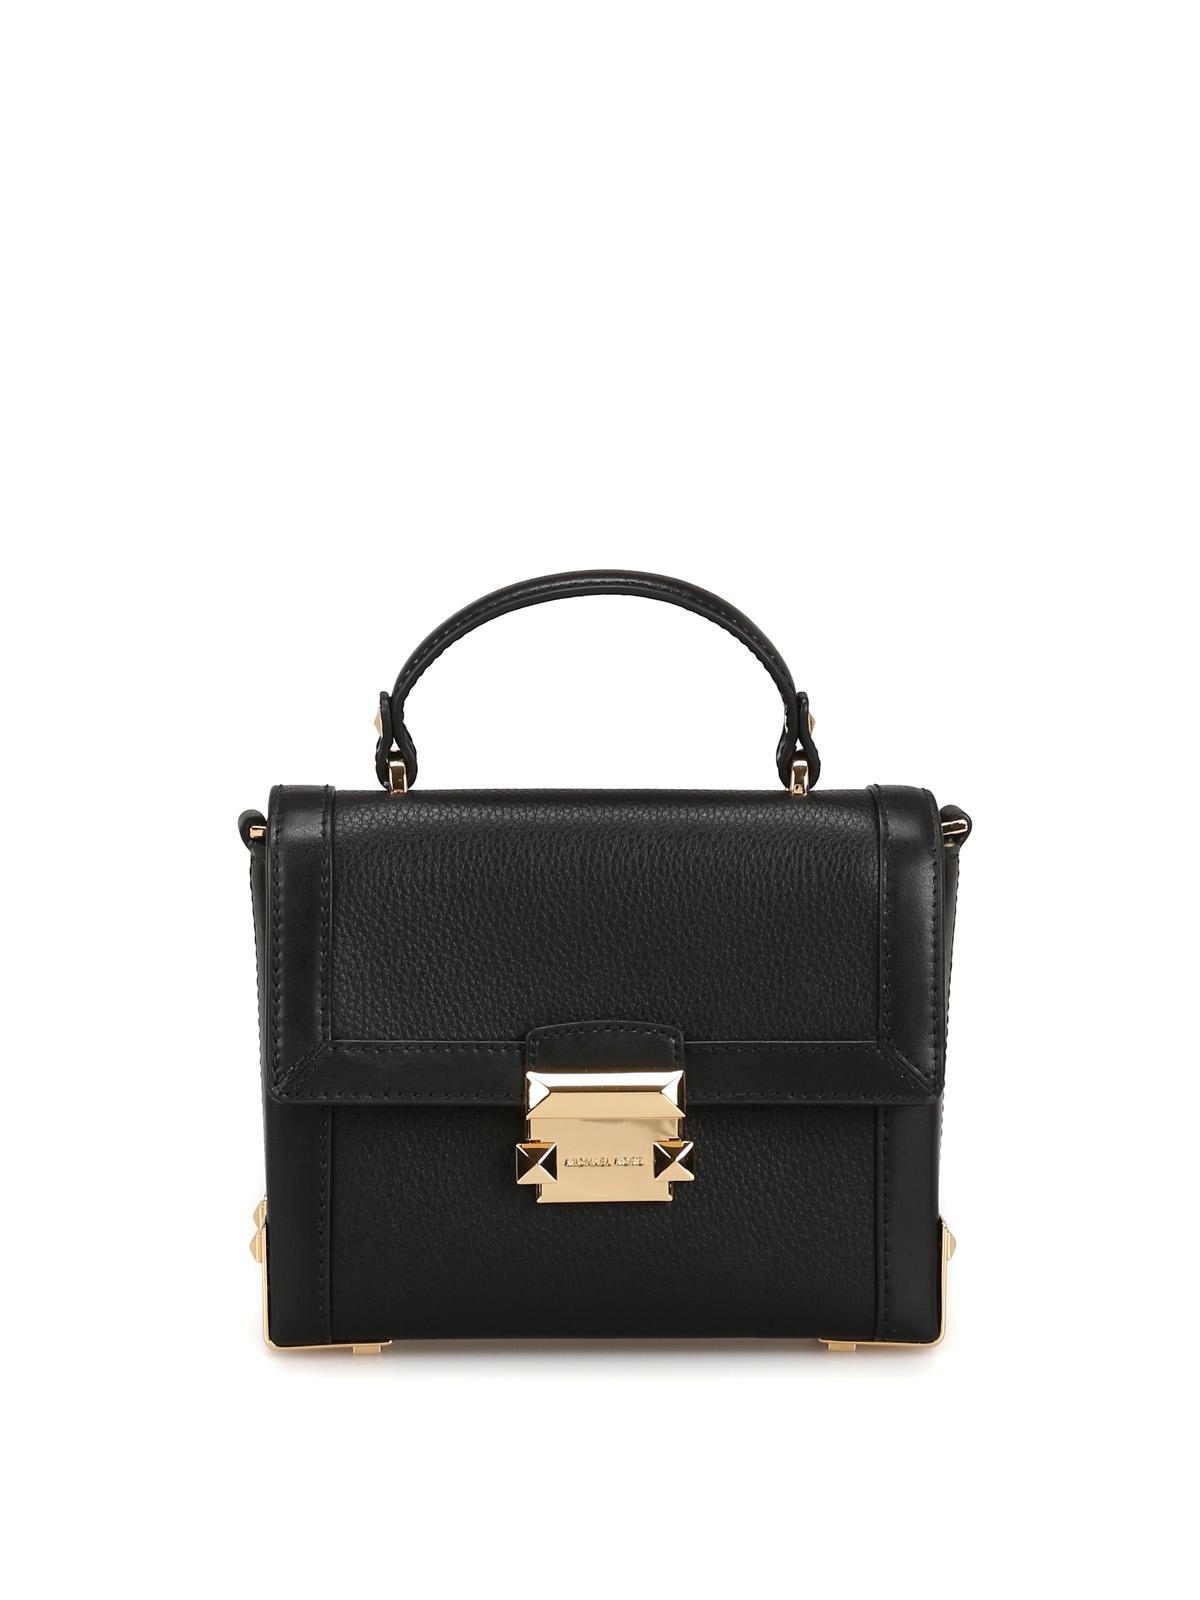 3f7d651a38e Michael Kors - Jayne black leather small trunk bag - cross body bags ...